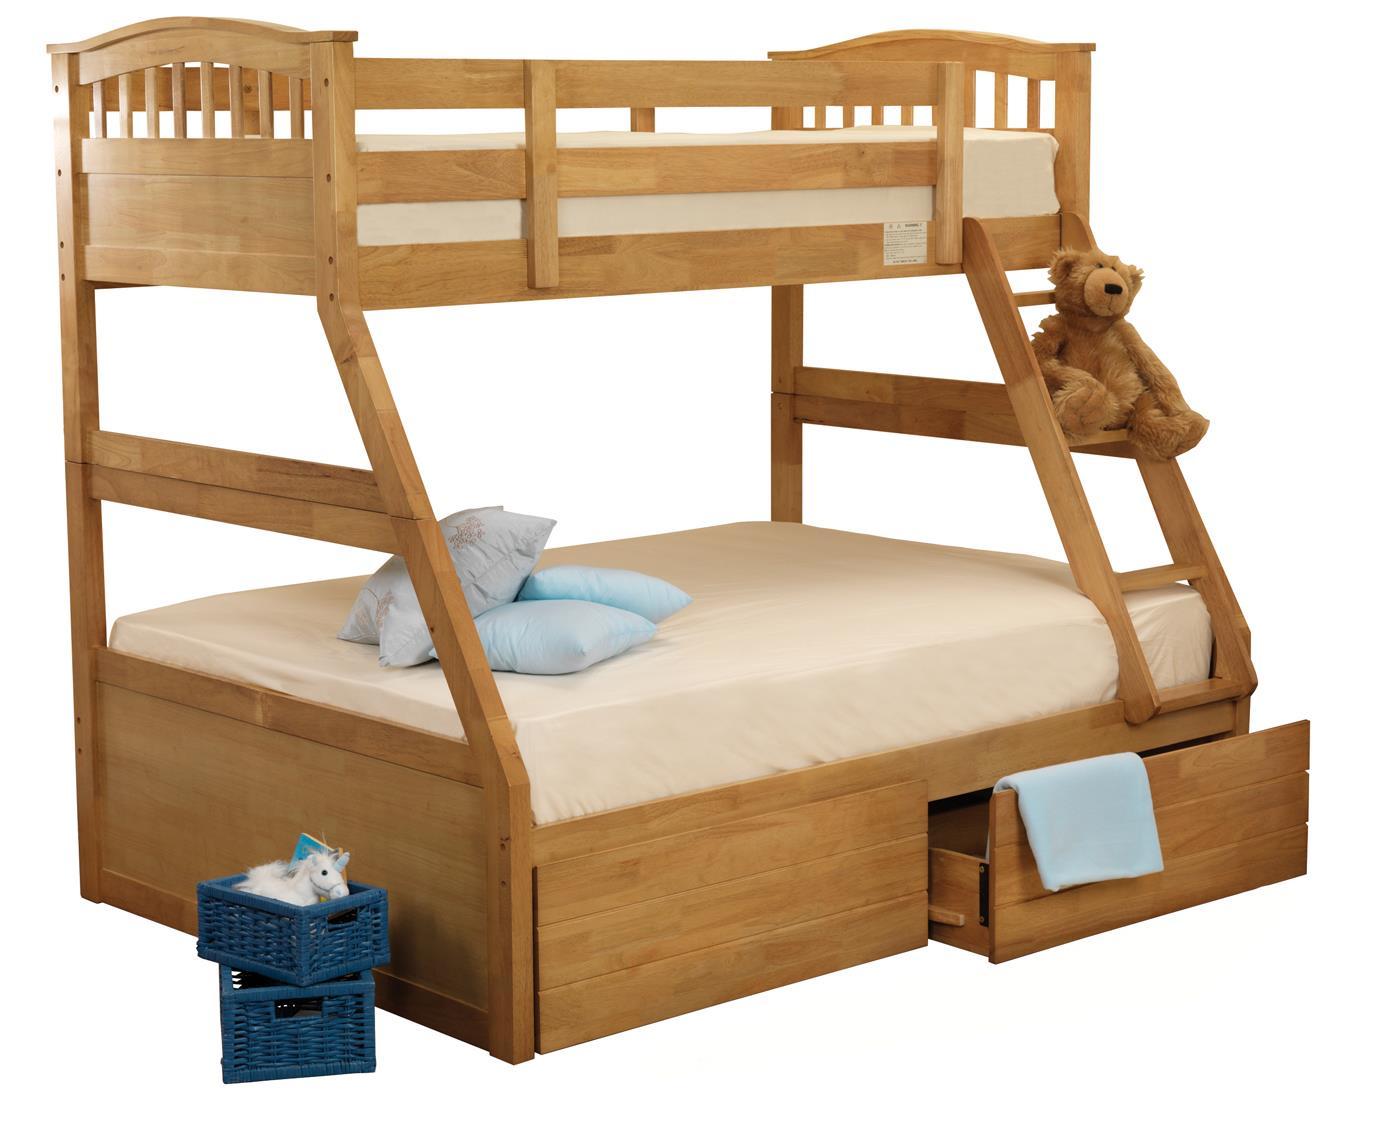 Astonishing Details About Sweet Dreams Apollo Epsom Wood Triple Sleeper Bunk Bed Oak Free Storage Drawer Inzonedesignstudio Interior Chair Design Inzonedesignstudiocom